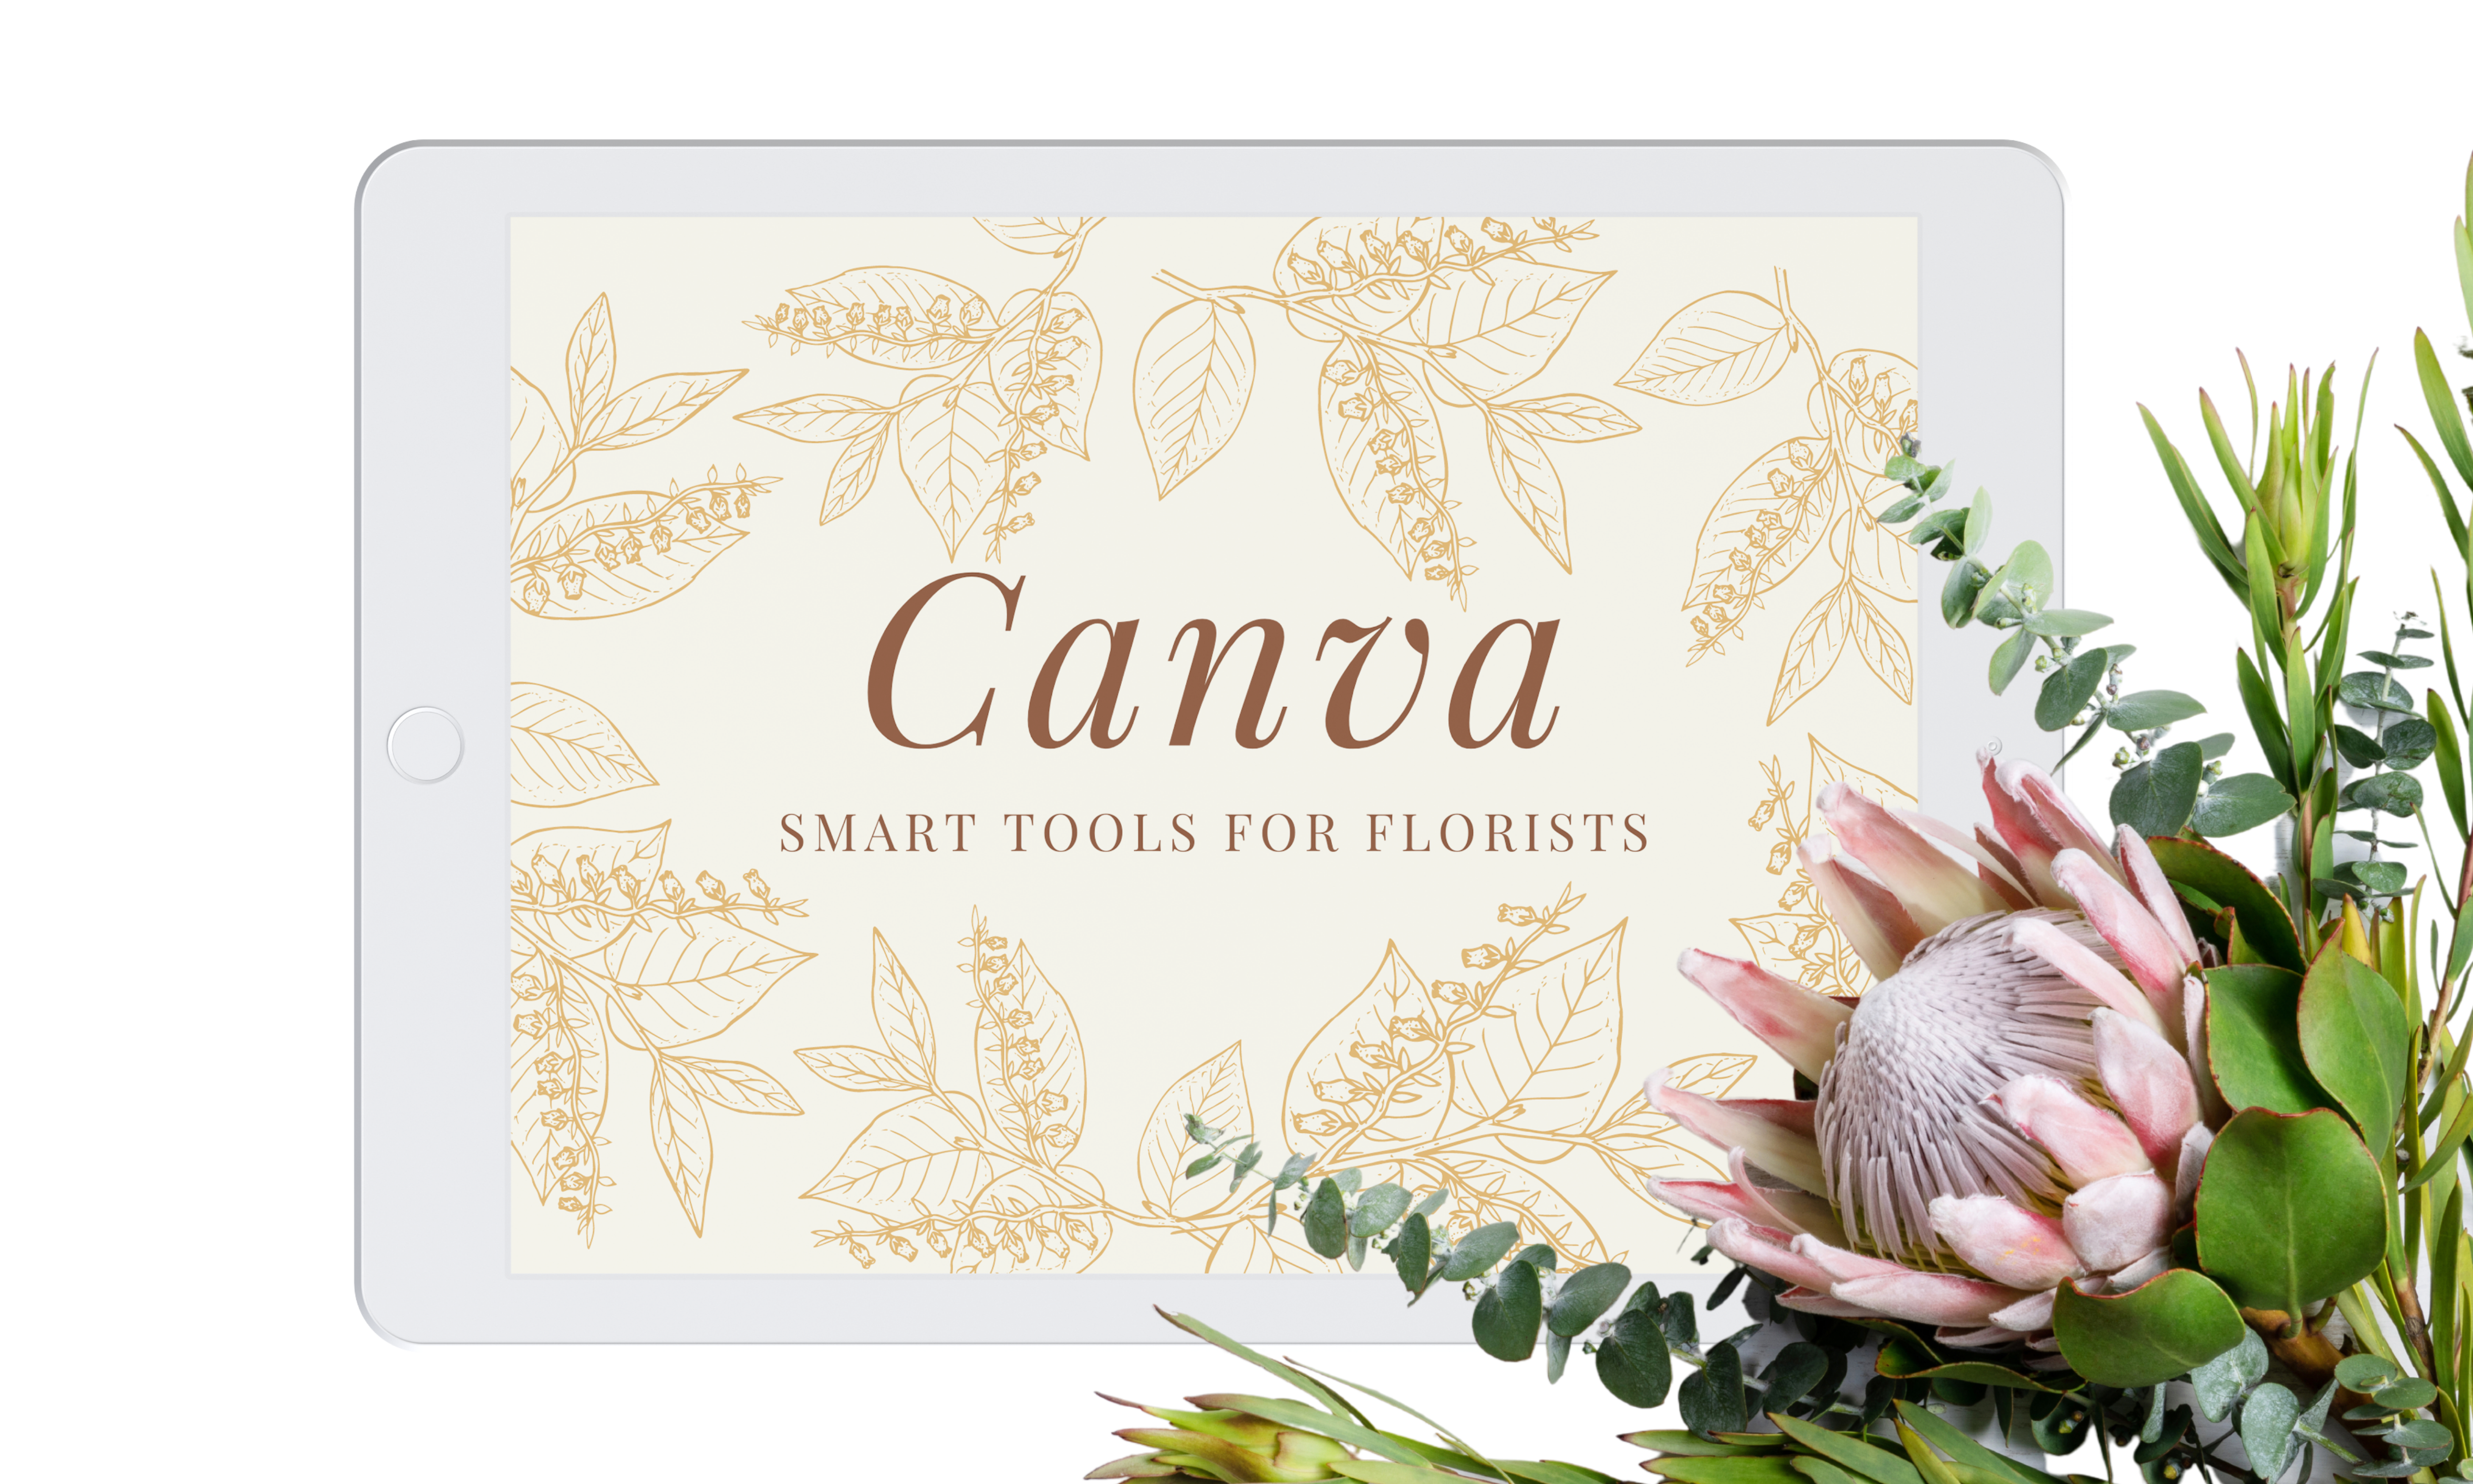 Canva-Smart Tools For Florists